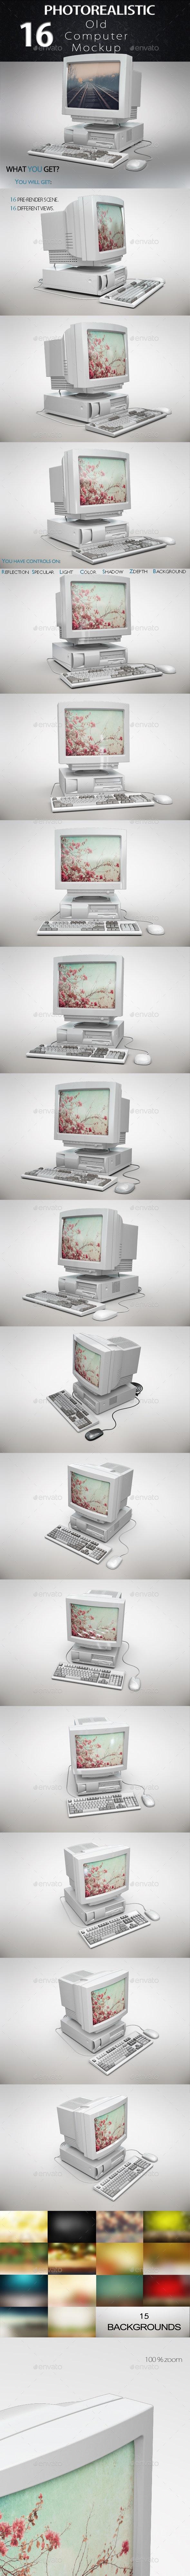 Vintage Computer Mockup - Product Mock-Ups Graphics